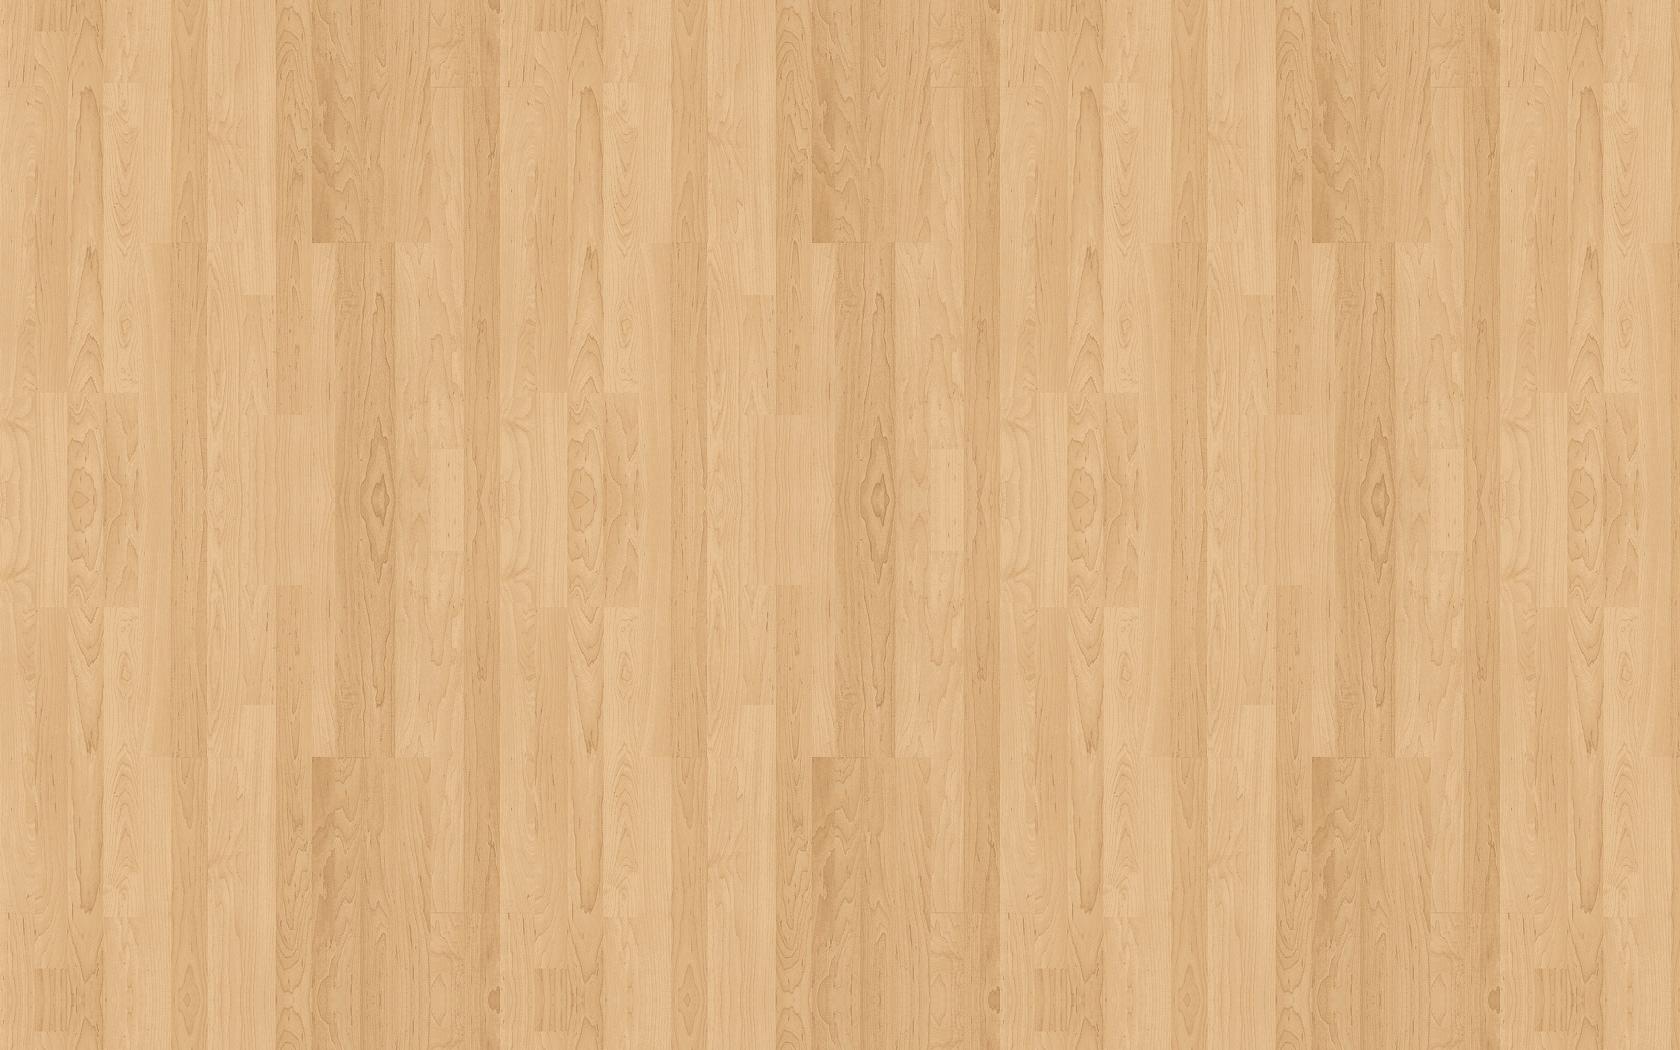 Textura de pared de madera - 1680x1050